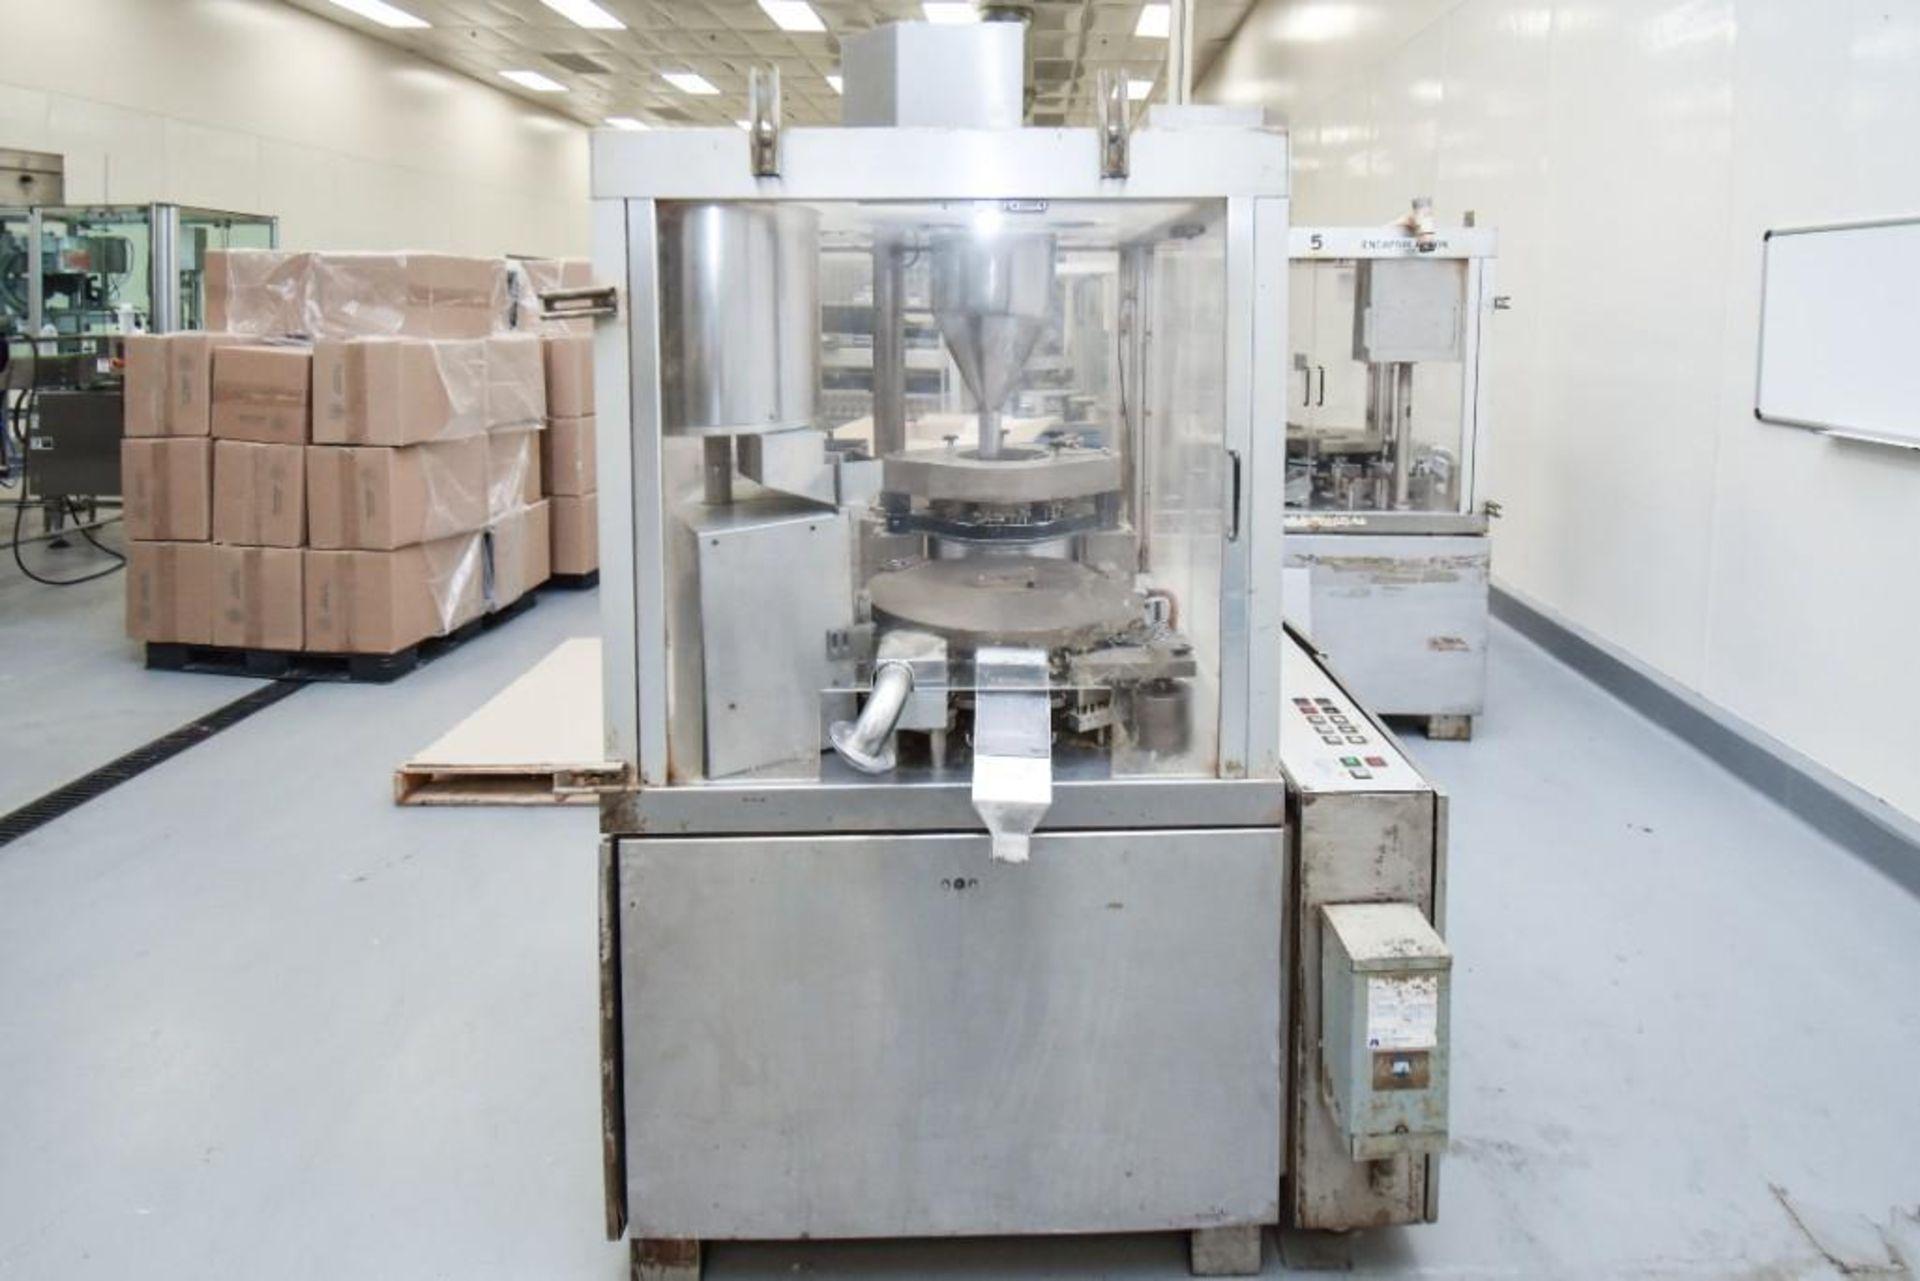 GFK 1500 Bosch Encapsulation Machine - Image 4 of 11